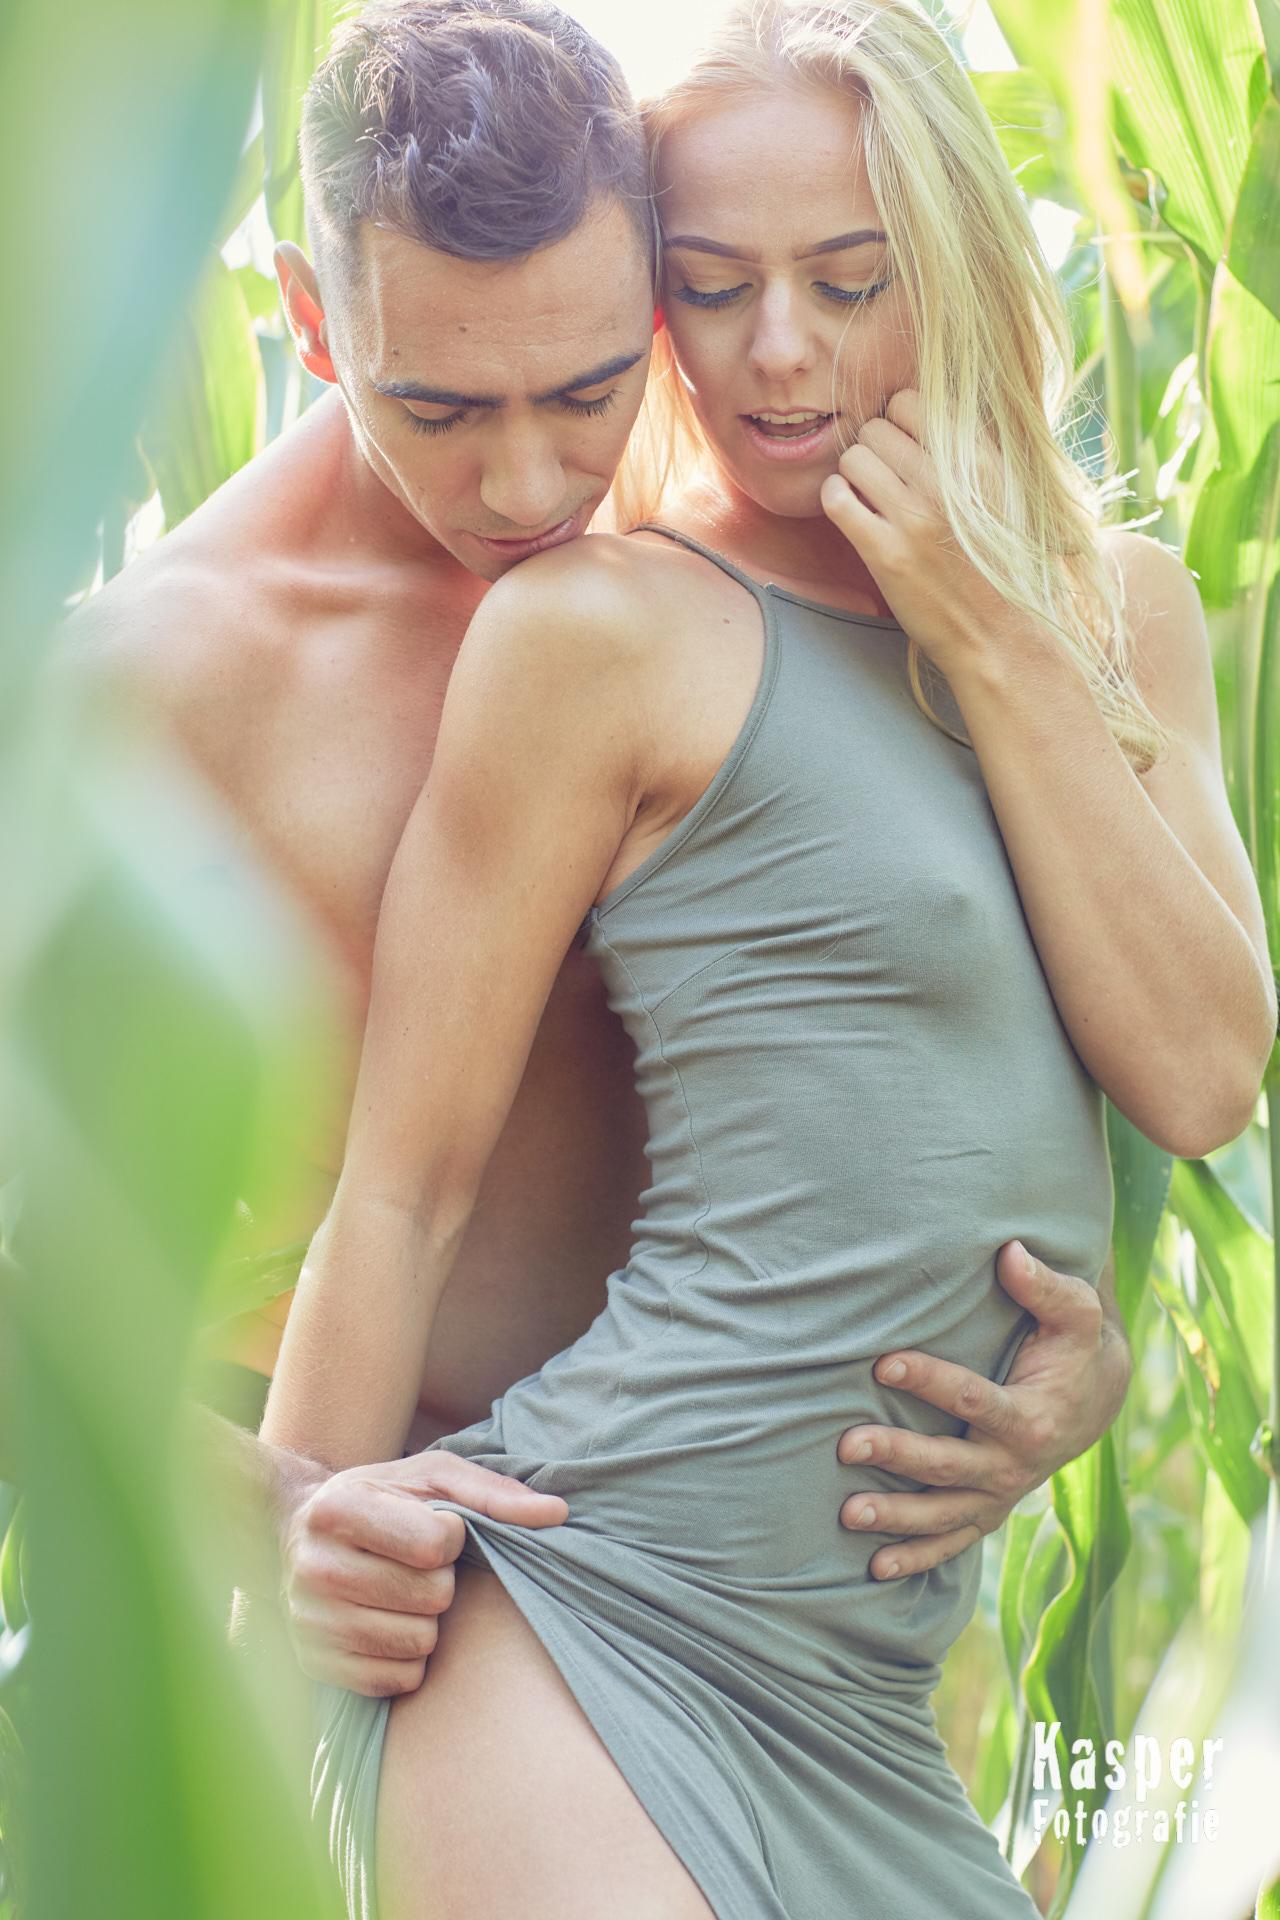 Hot Corn Couple